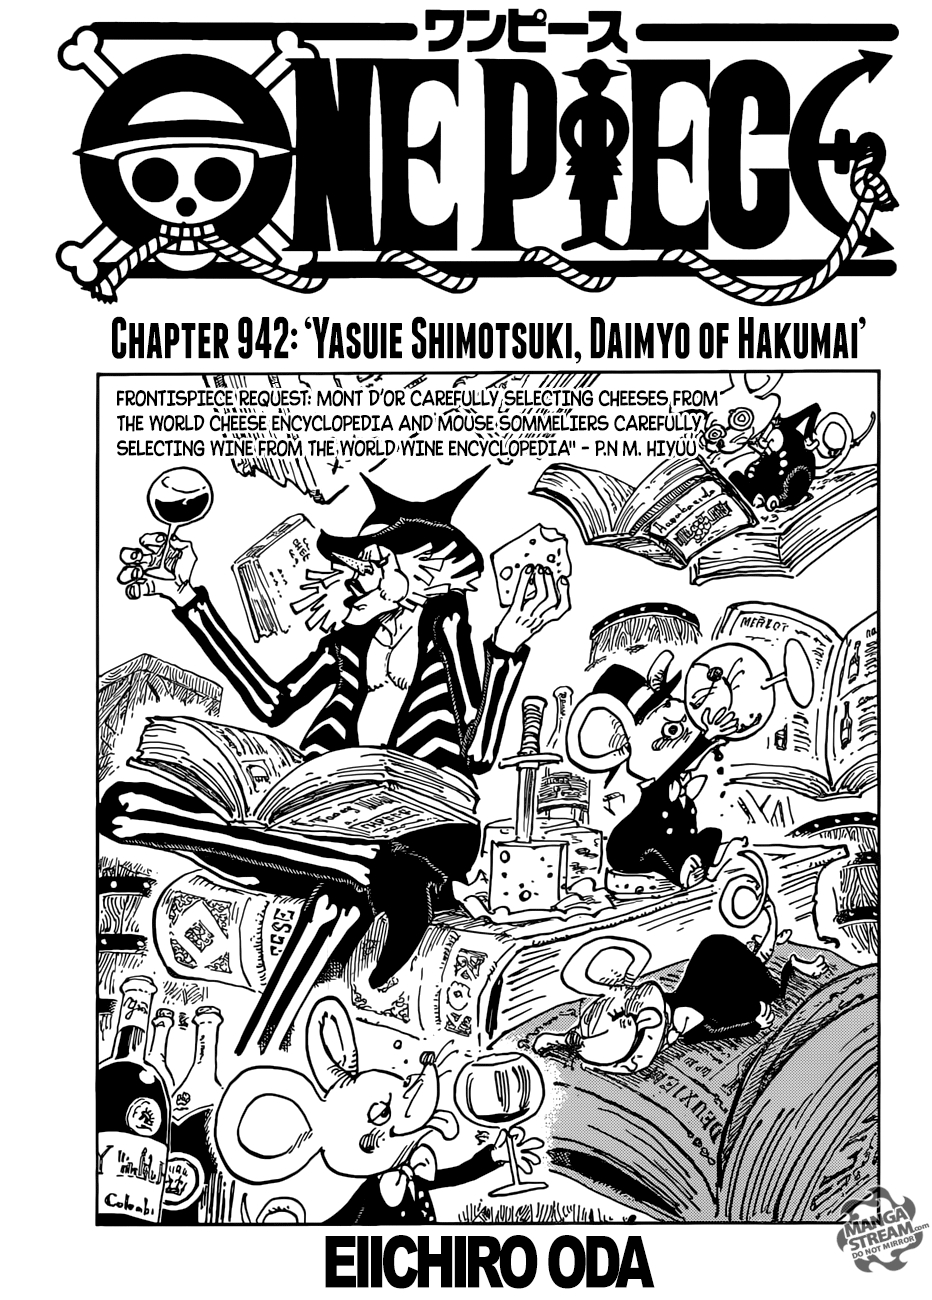 https://manga.mangadogs.com/comics/pic2/32/96/617257/db0b3f8689f0d4362103b80065e063c8.jpg Page 1